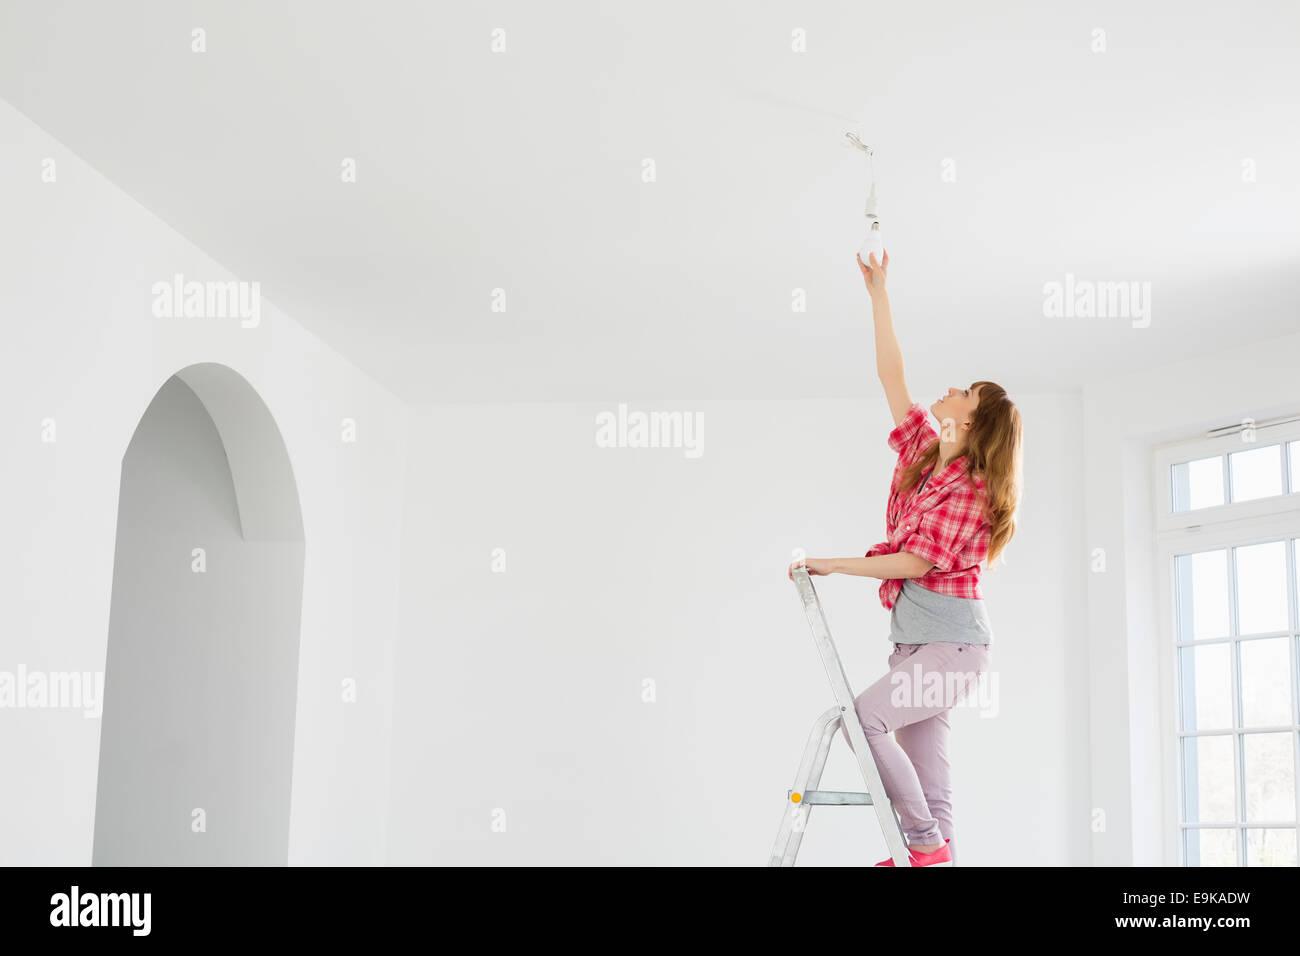 Full-length of woman on ladder fitting light bulb in new house - Stock Image